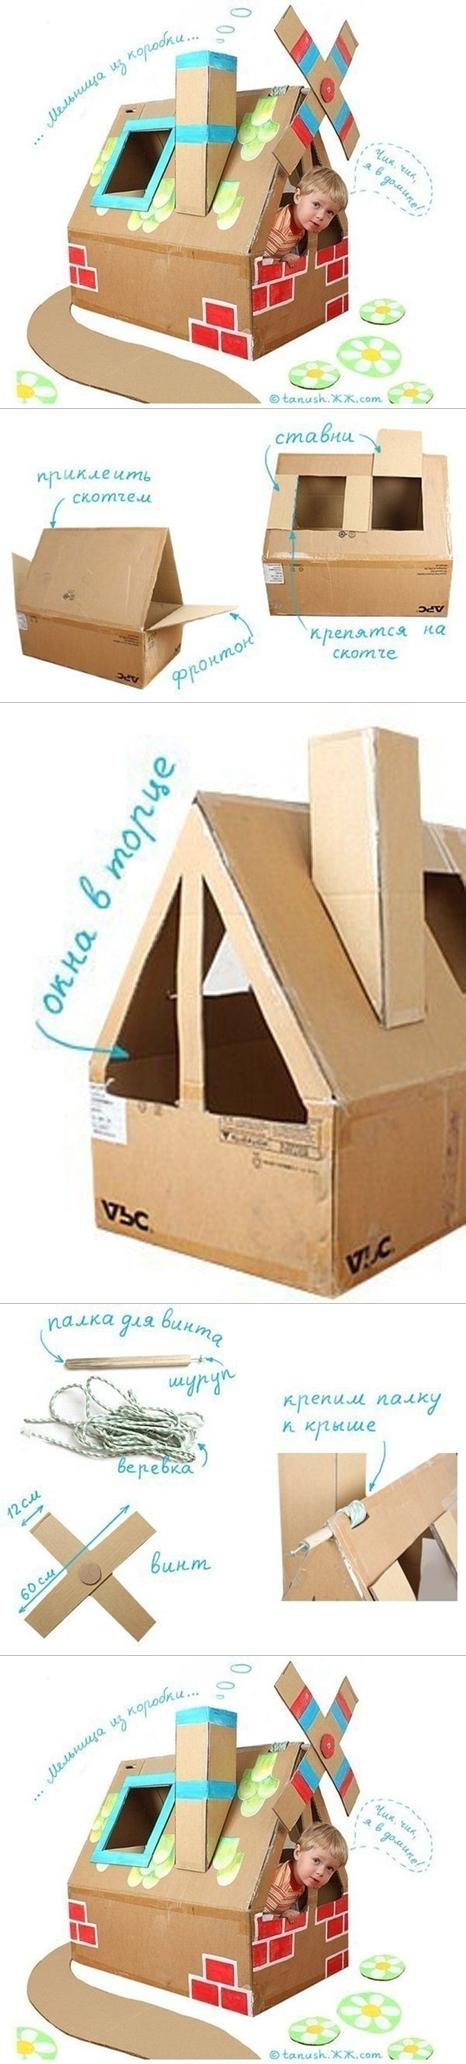 carton box playhouse